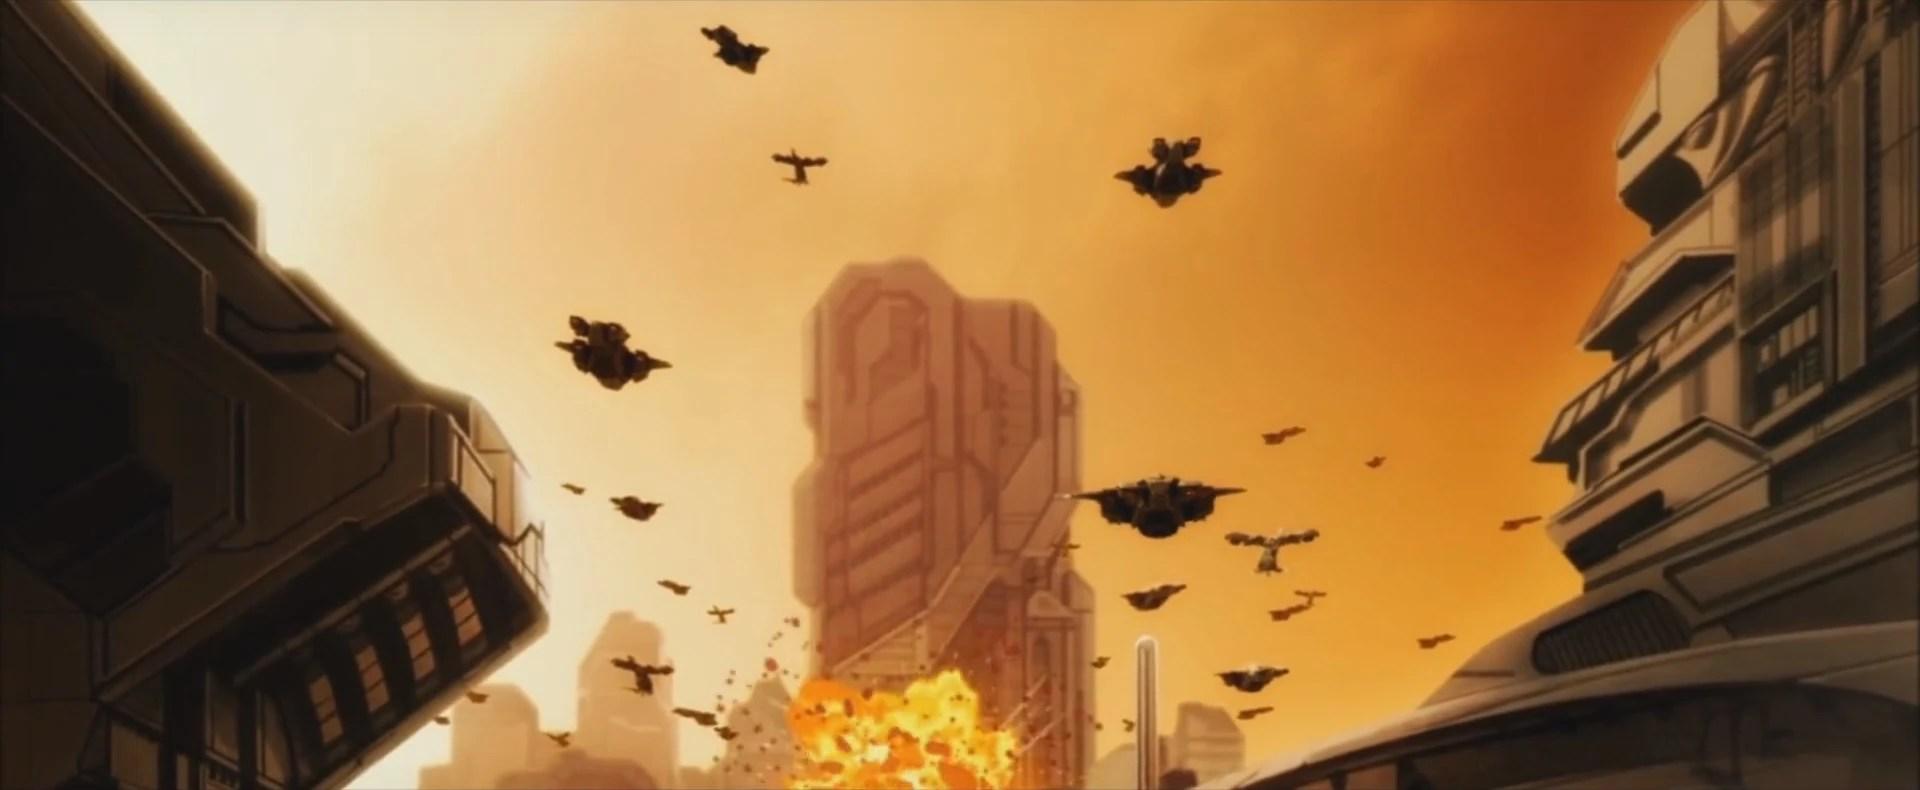 Halo Wallpaper Fall Of Reach Insurrection Halo Nation The Halo Encyclopedia Halo